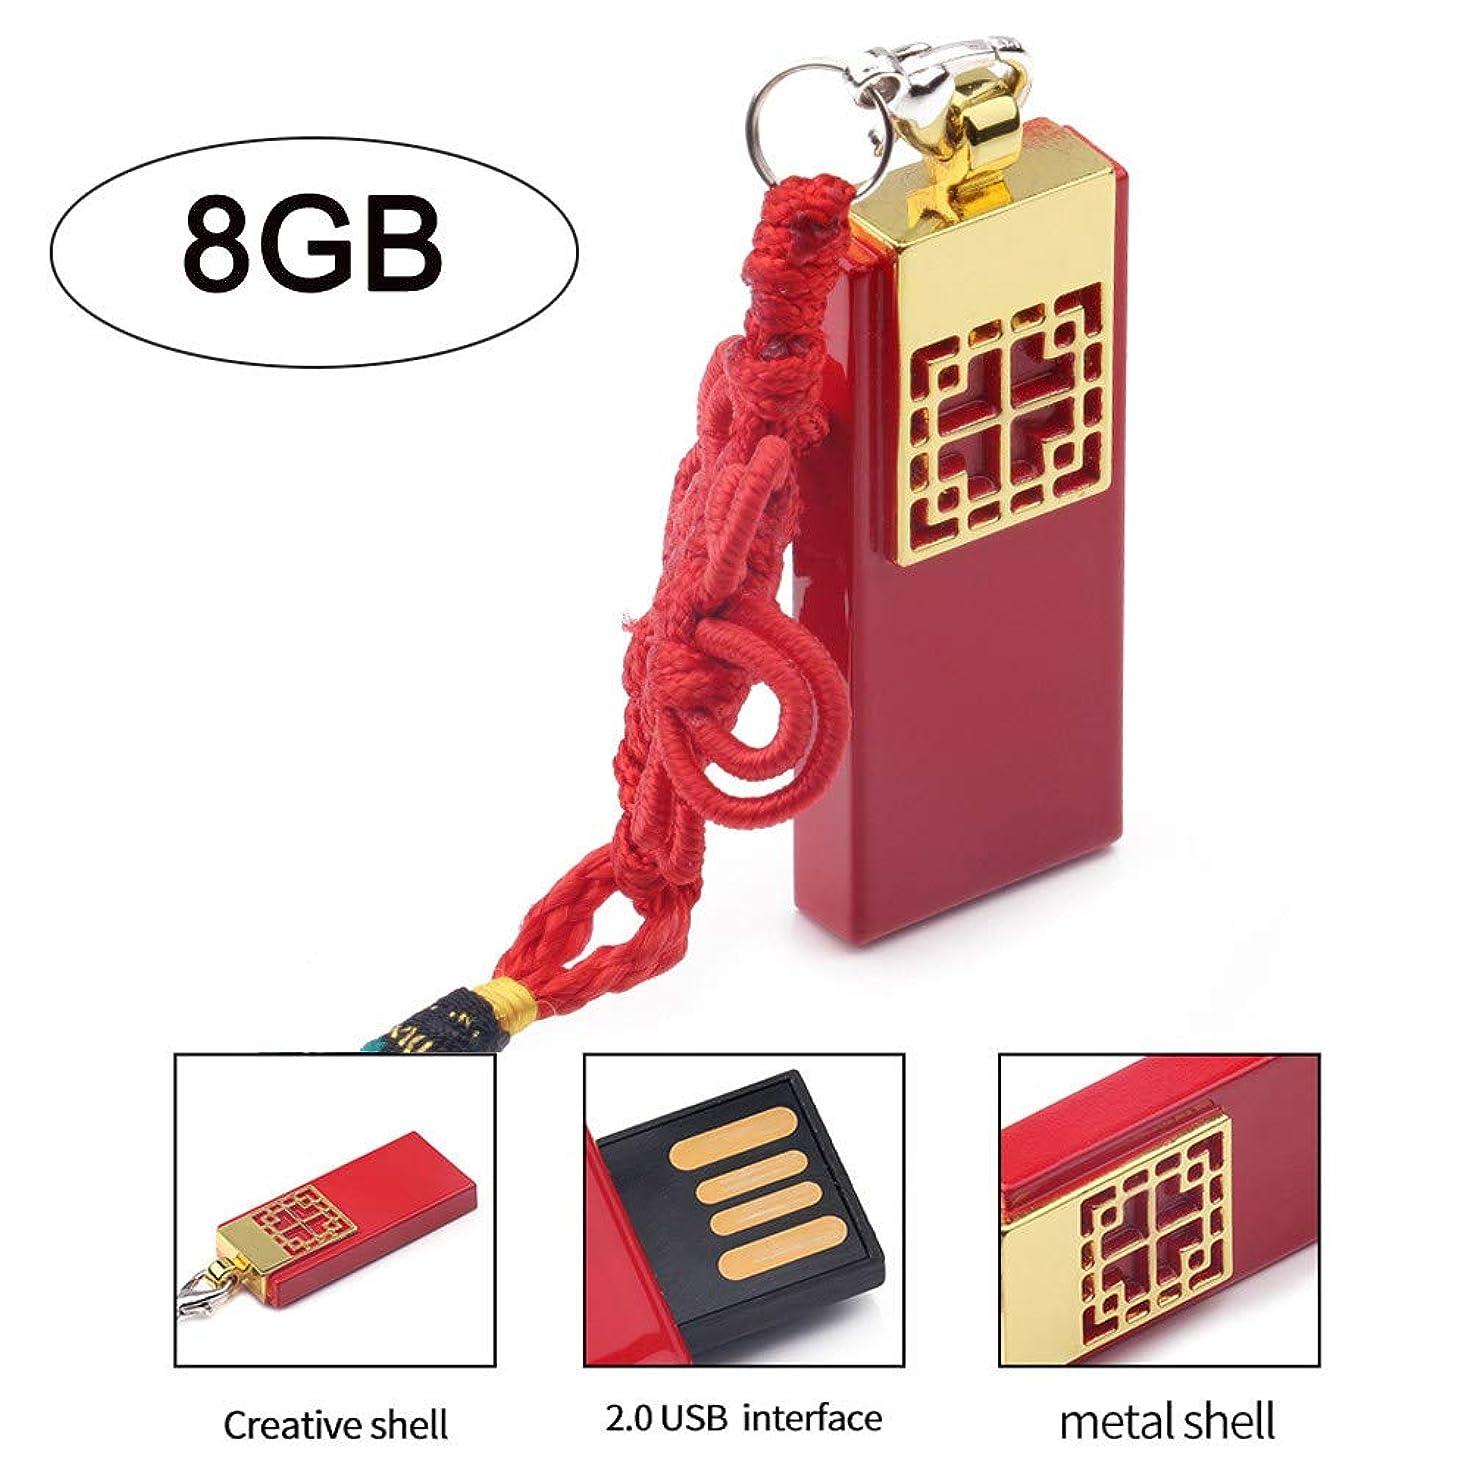 Euone U Disk, USB 2.0 8GB Flash Drive Memory Stick Storage Pen Disk Digital U Disk